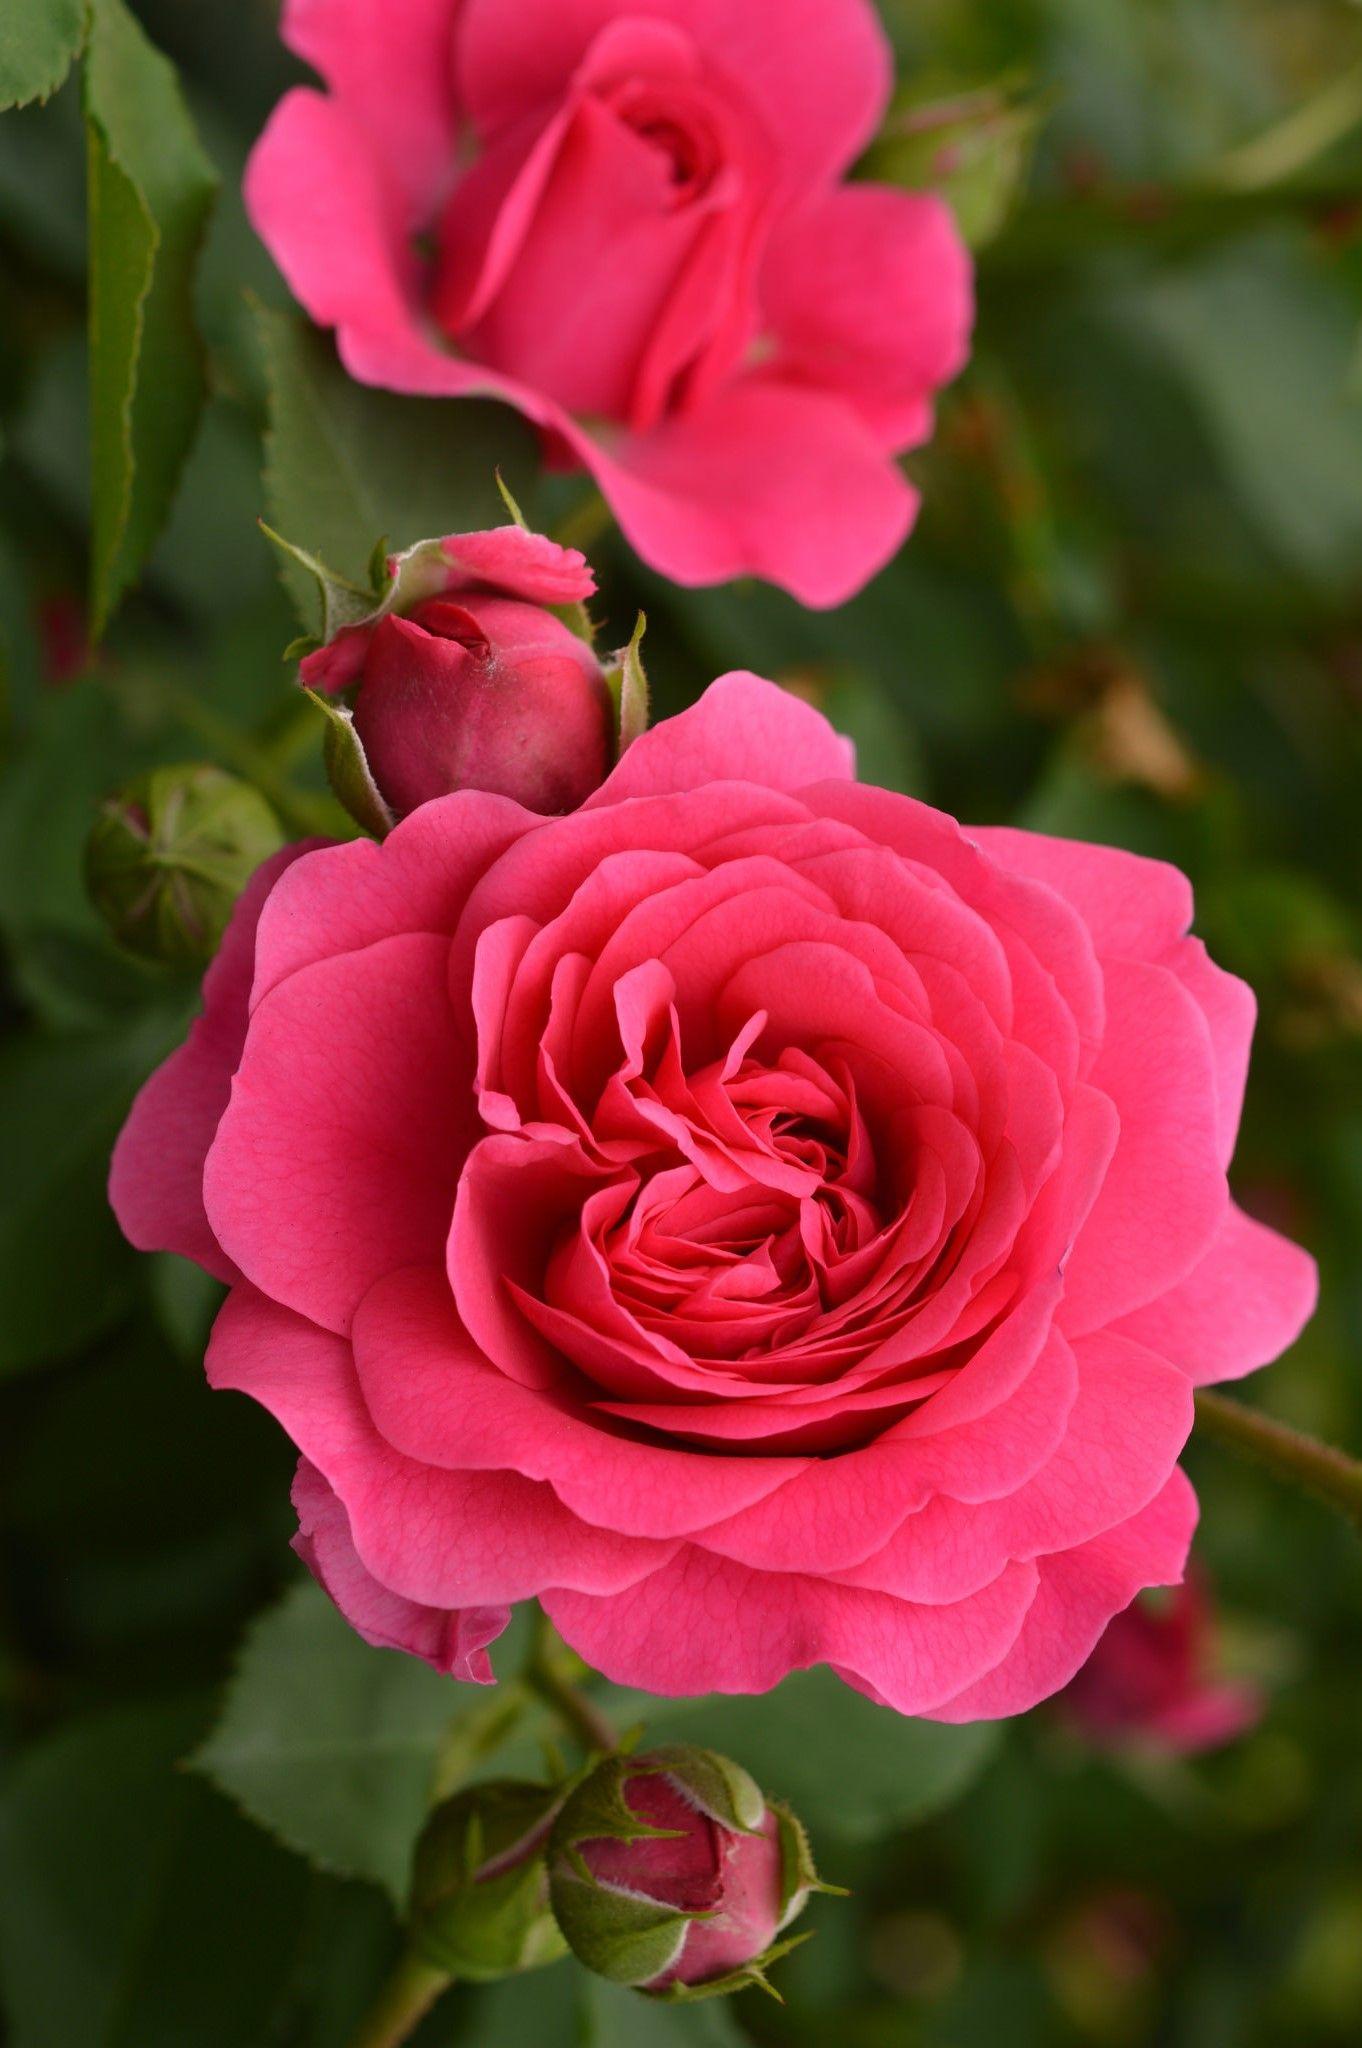 William shakespeare rose most beautiful flower photogaphy roses william shakespeare rose most beautiful flower photogaphy izmirmasajfo